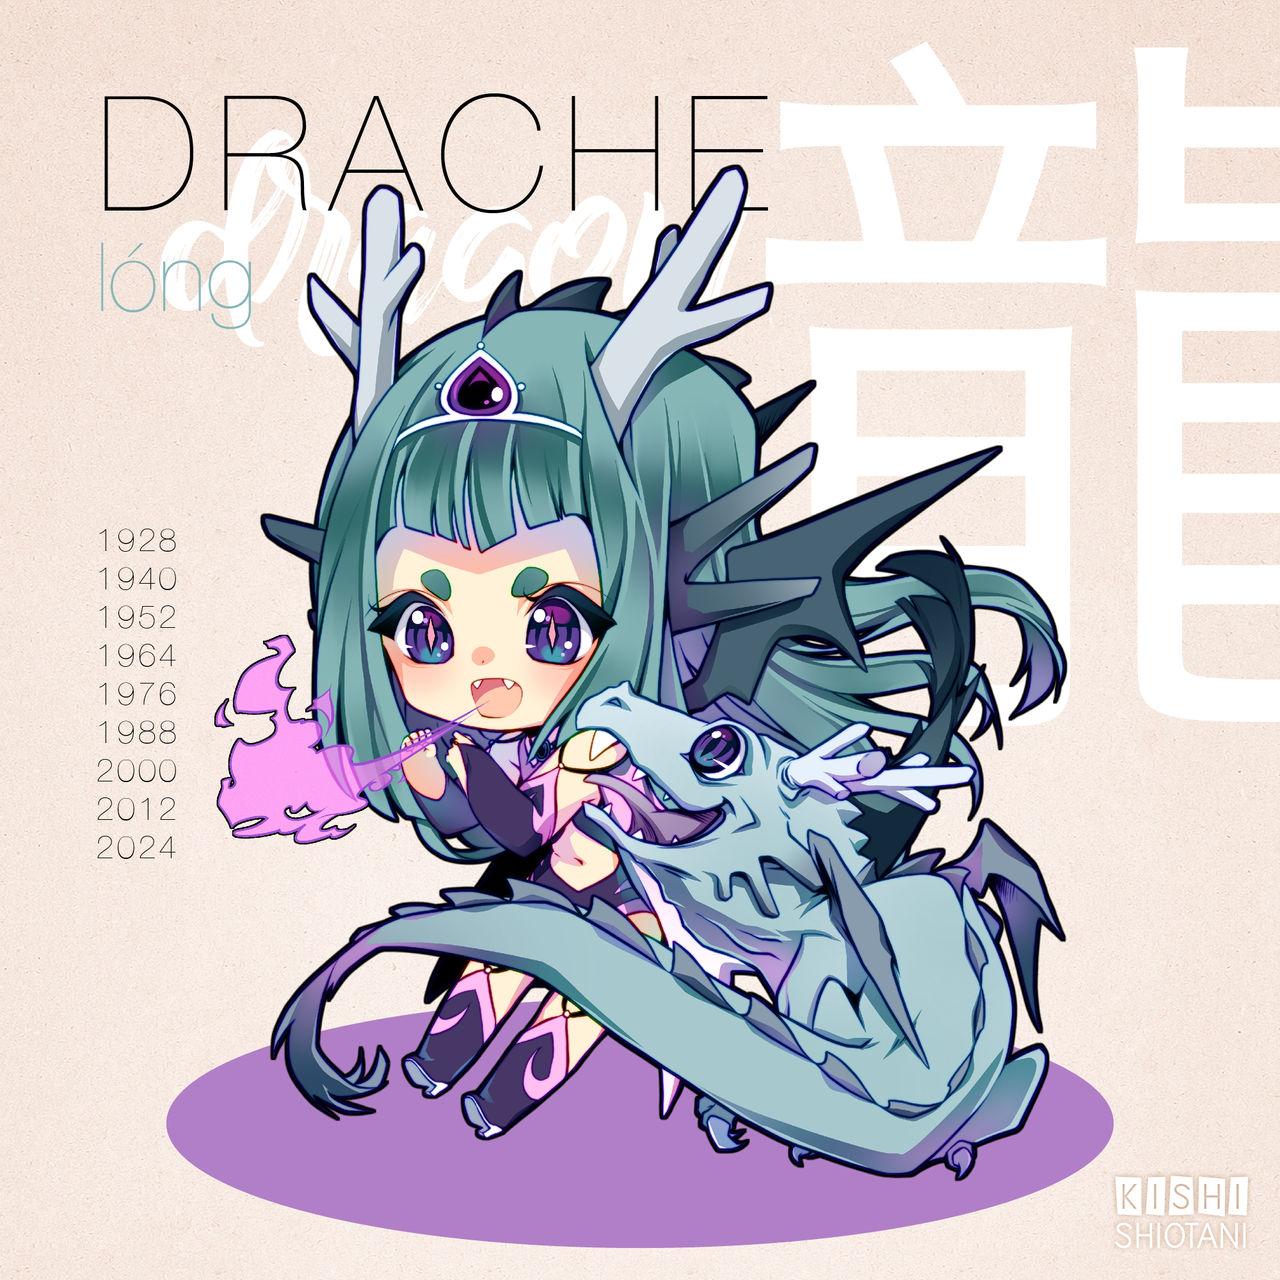 Chinese Zodiac Sign - DRAGON by KishiShiotani on DeviantArt